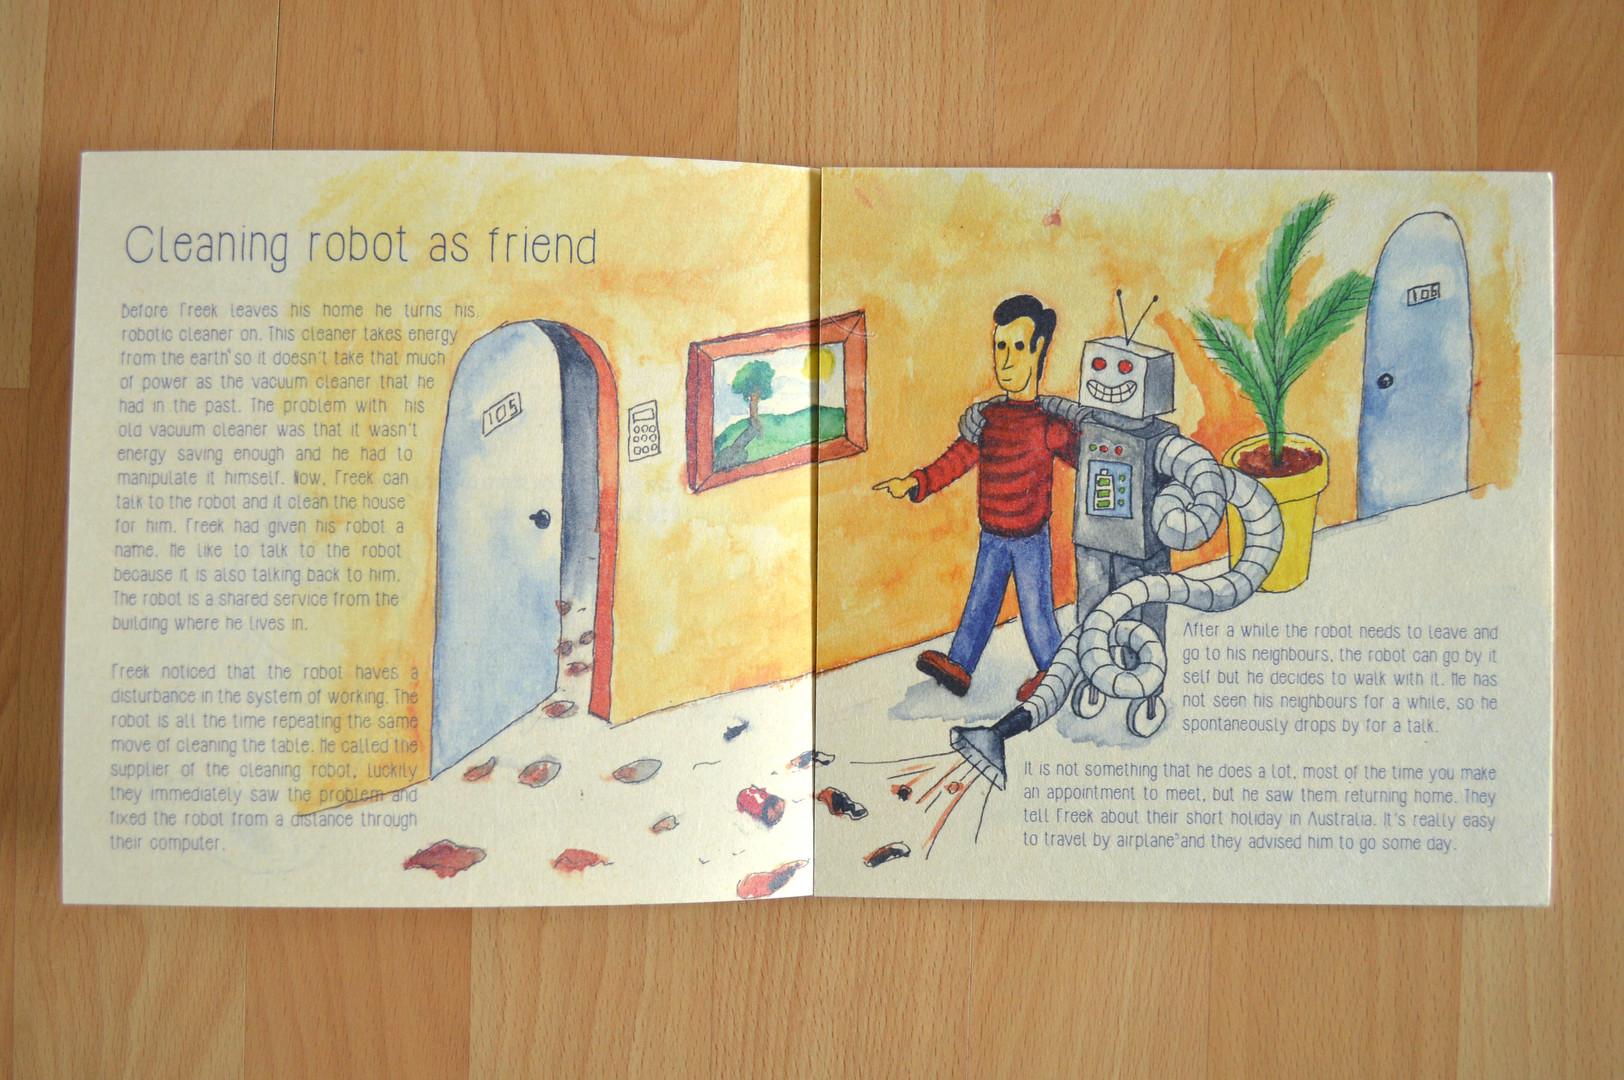 Verhaal 'Cleaning robot as friend'